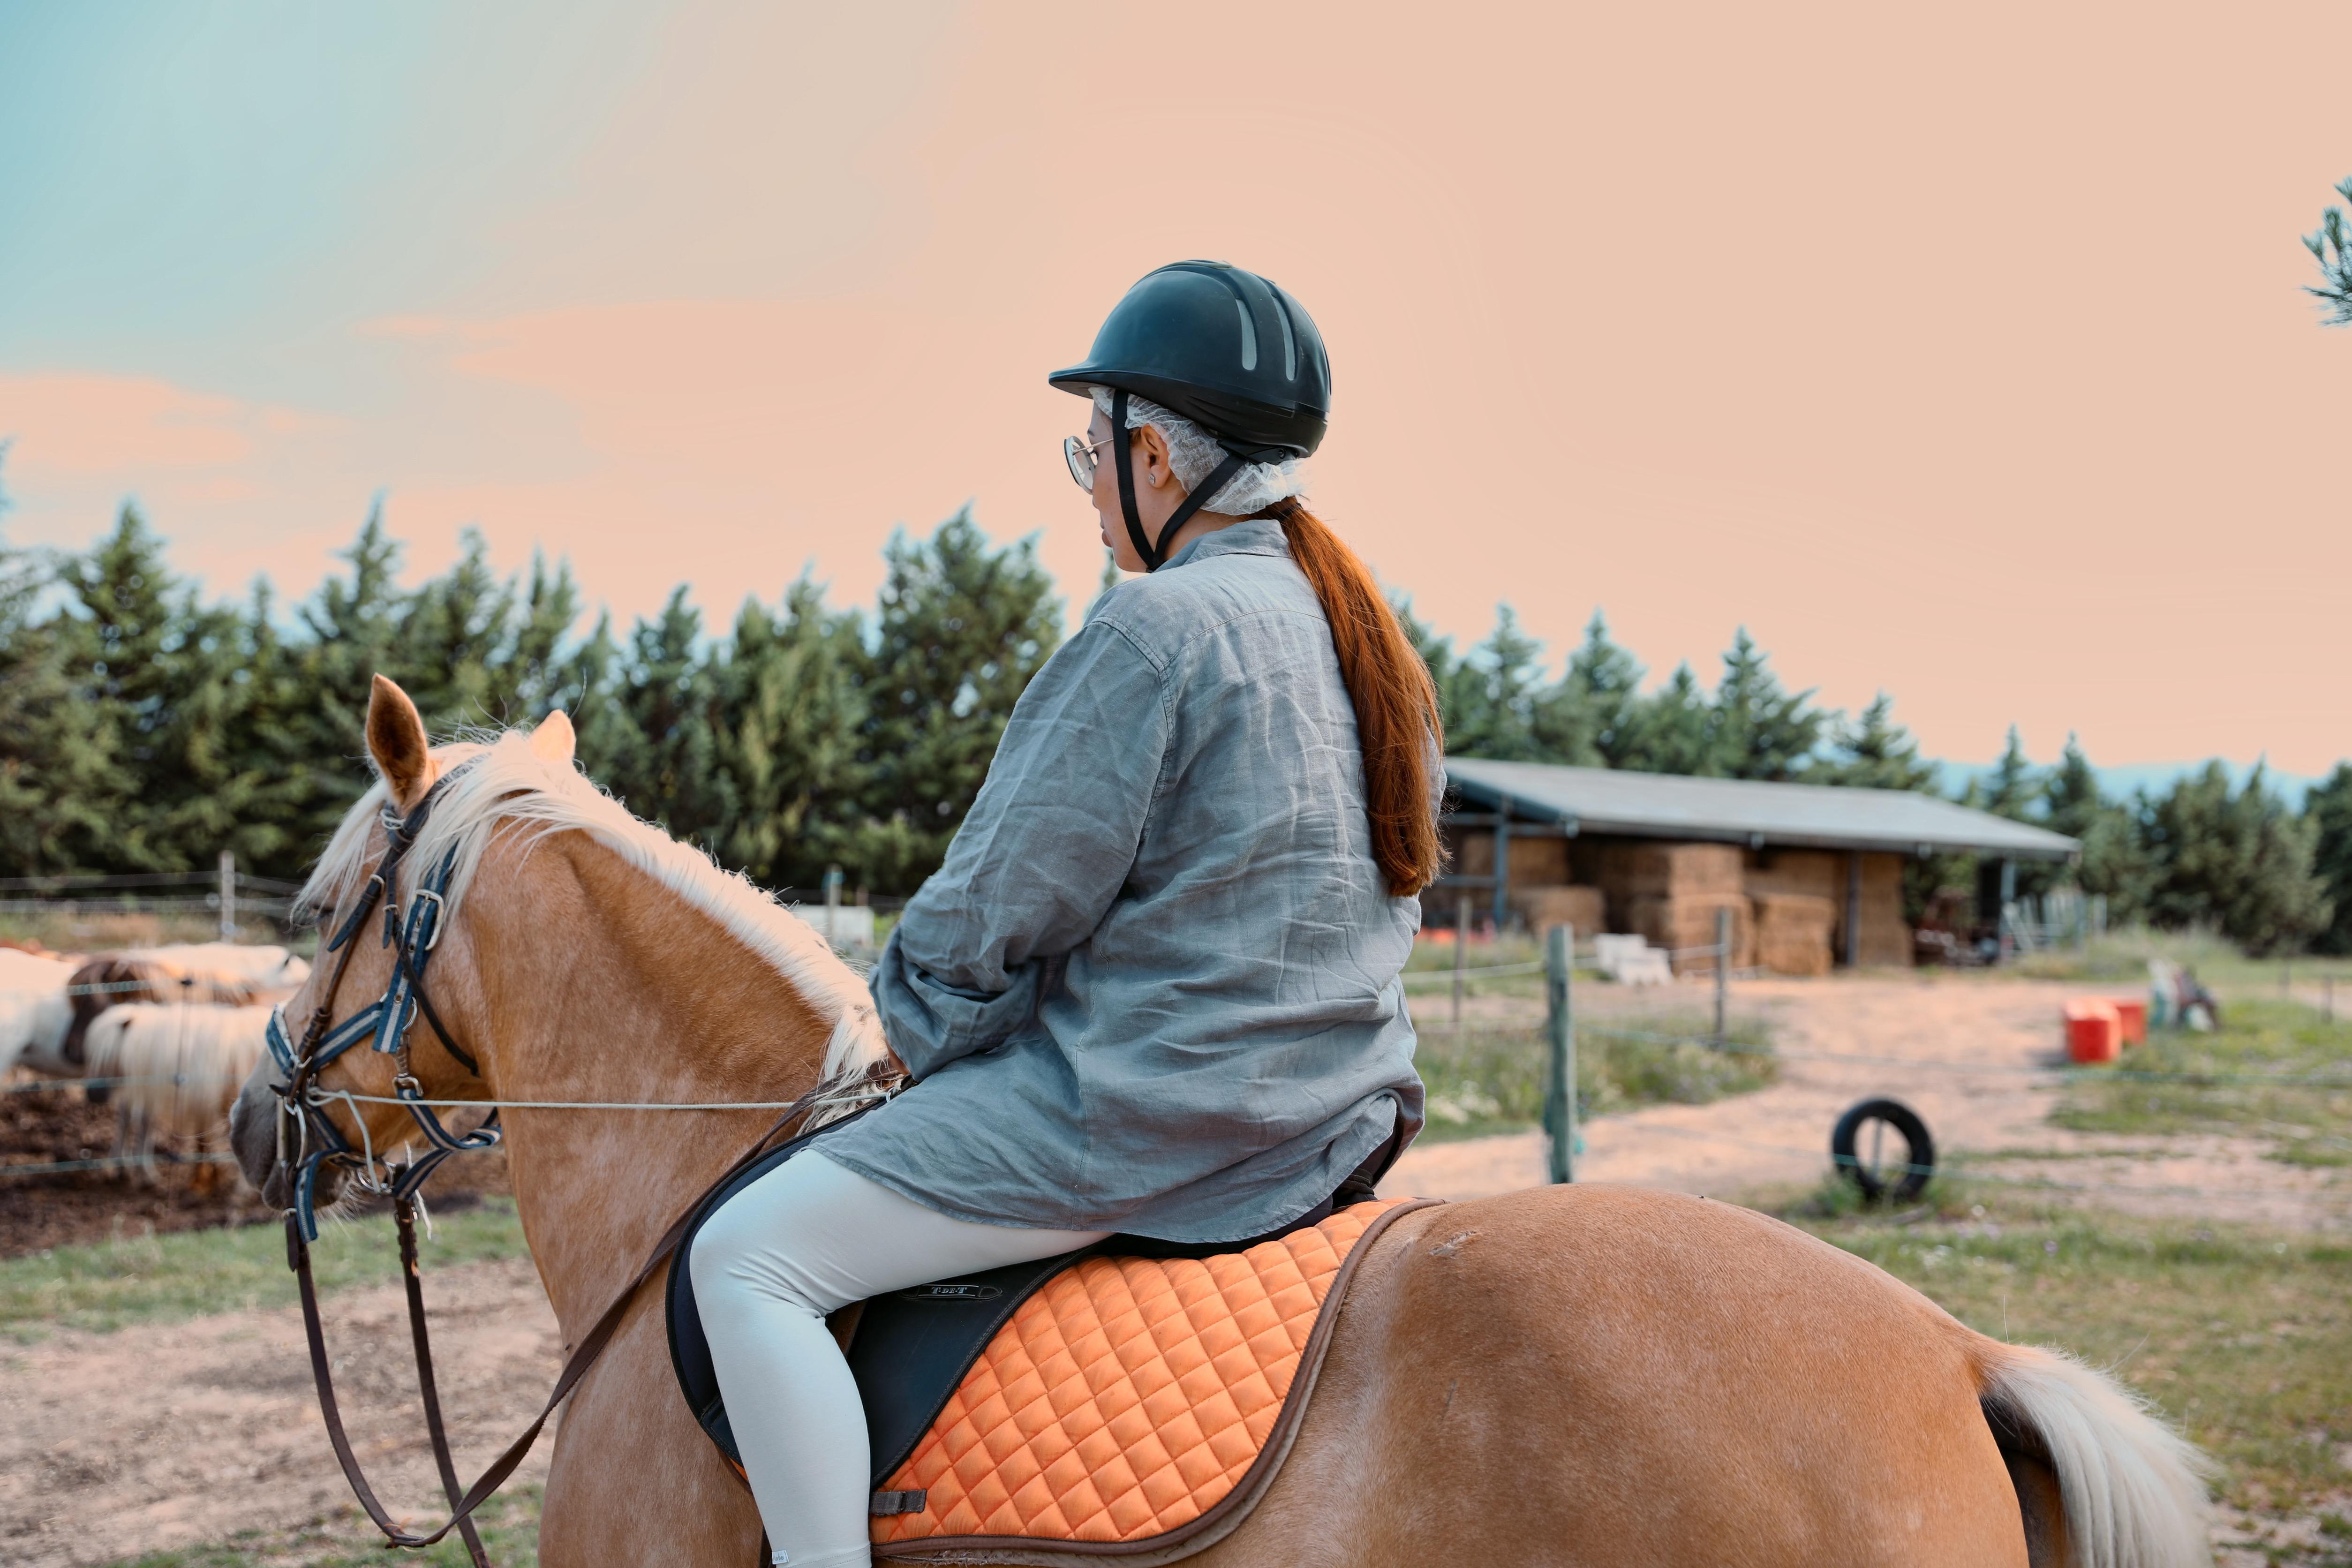 hanushka toni horse palamino provence horse riding